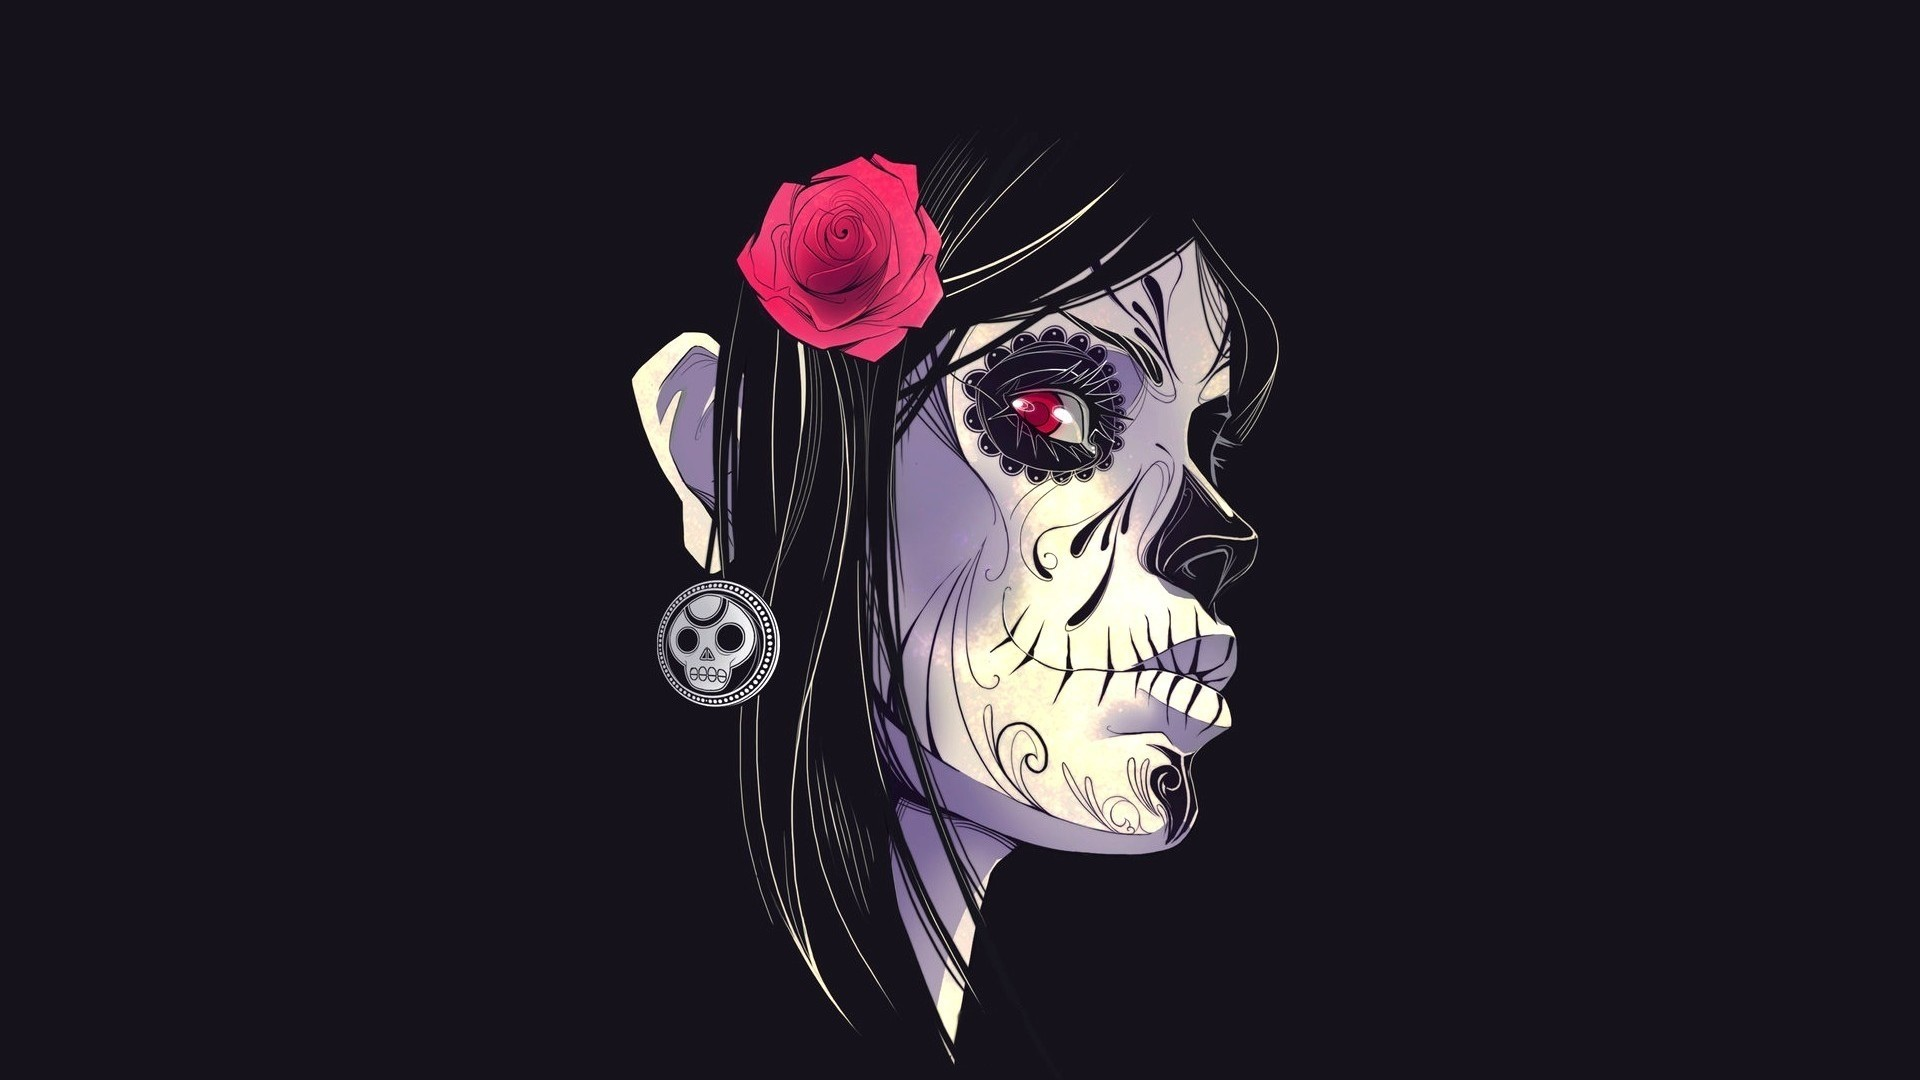 Dead Rose Wallpaper